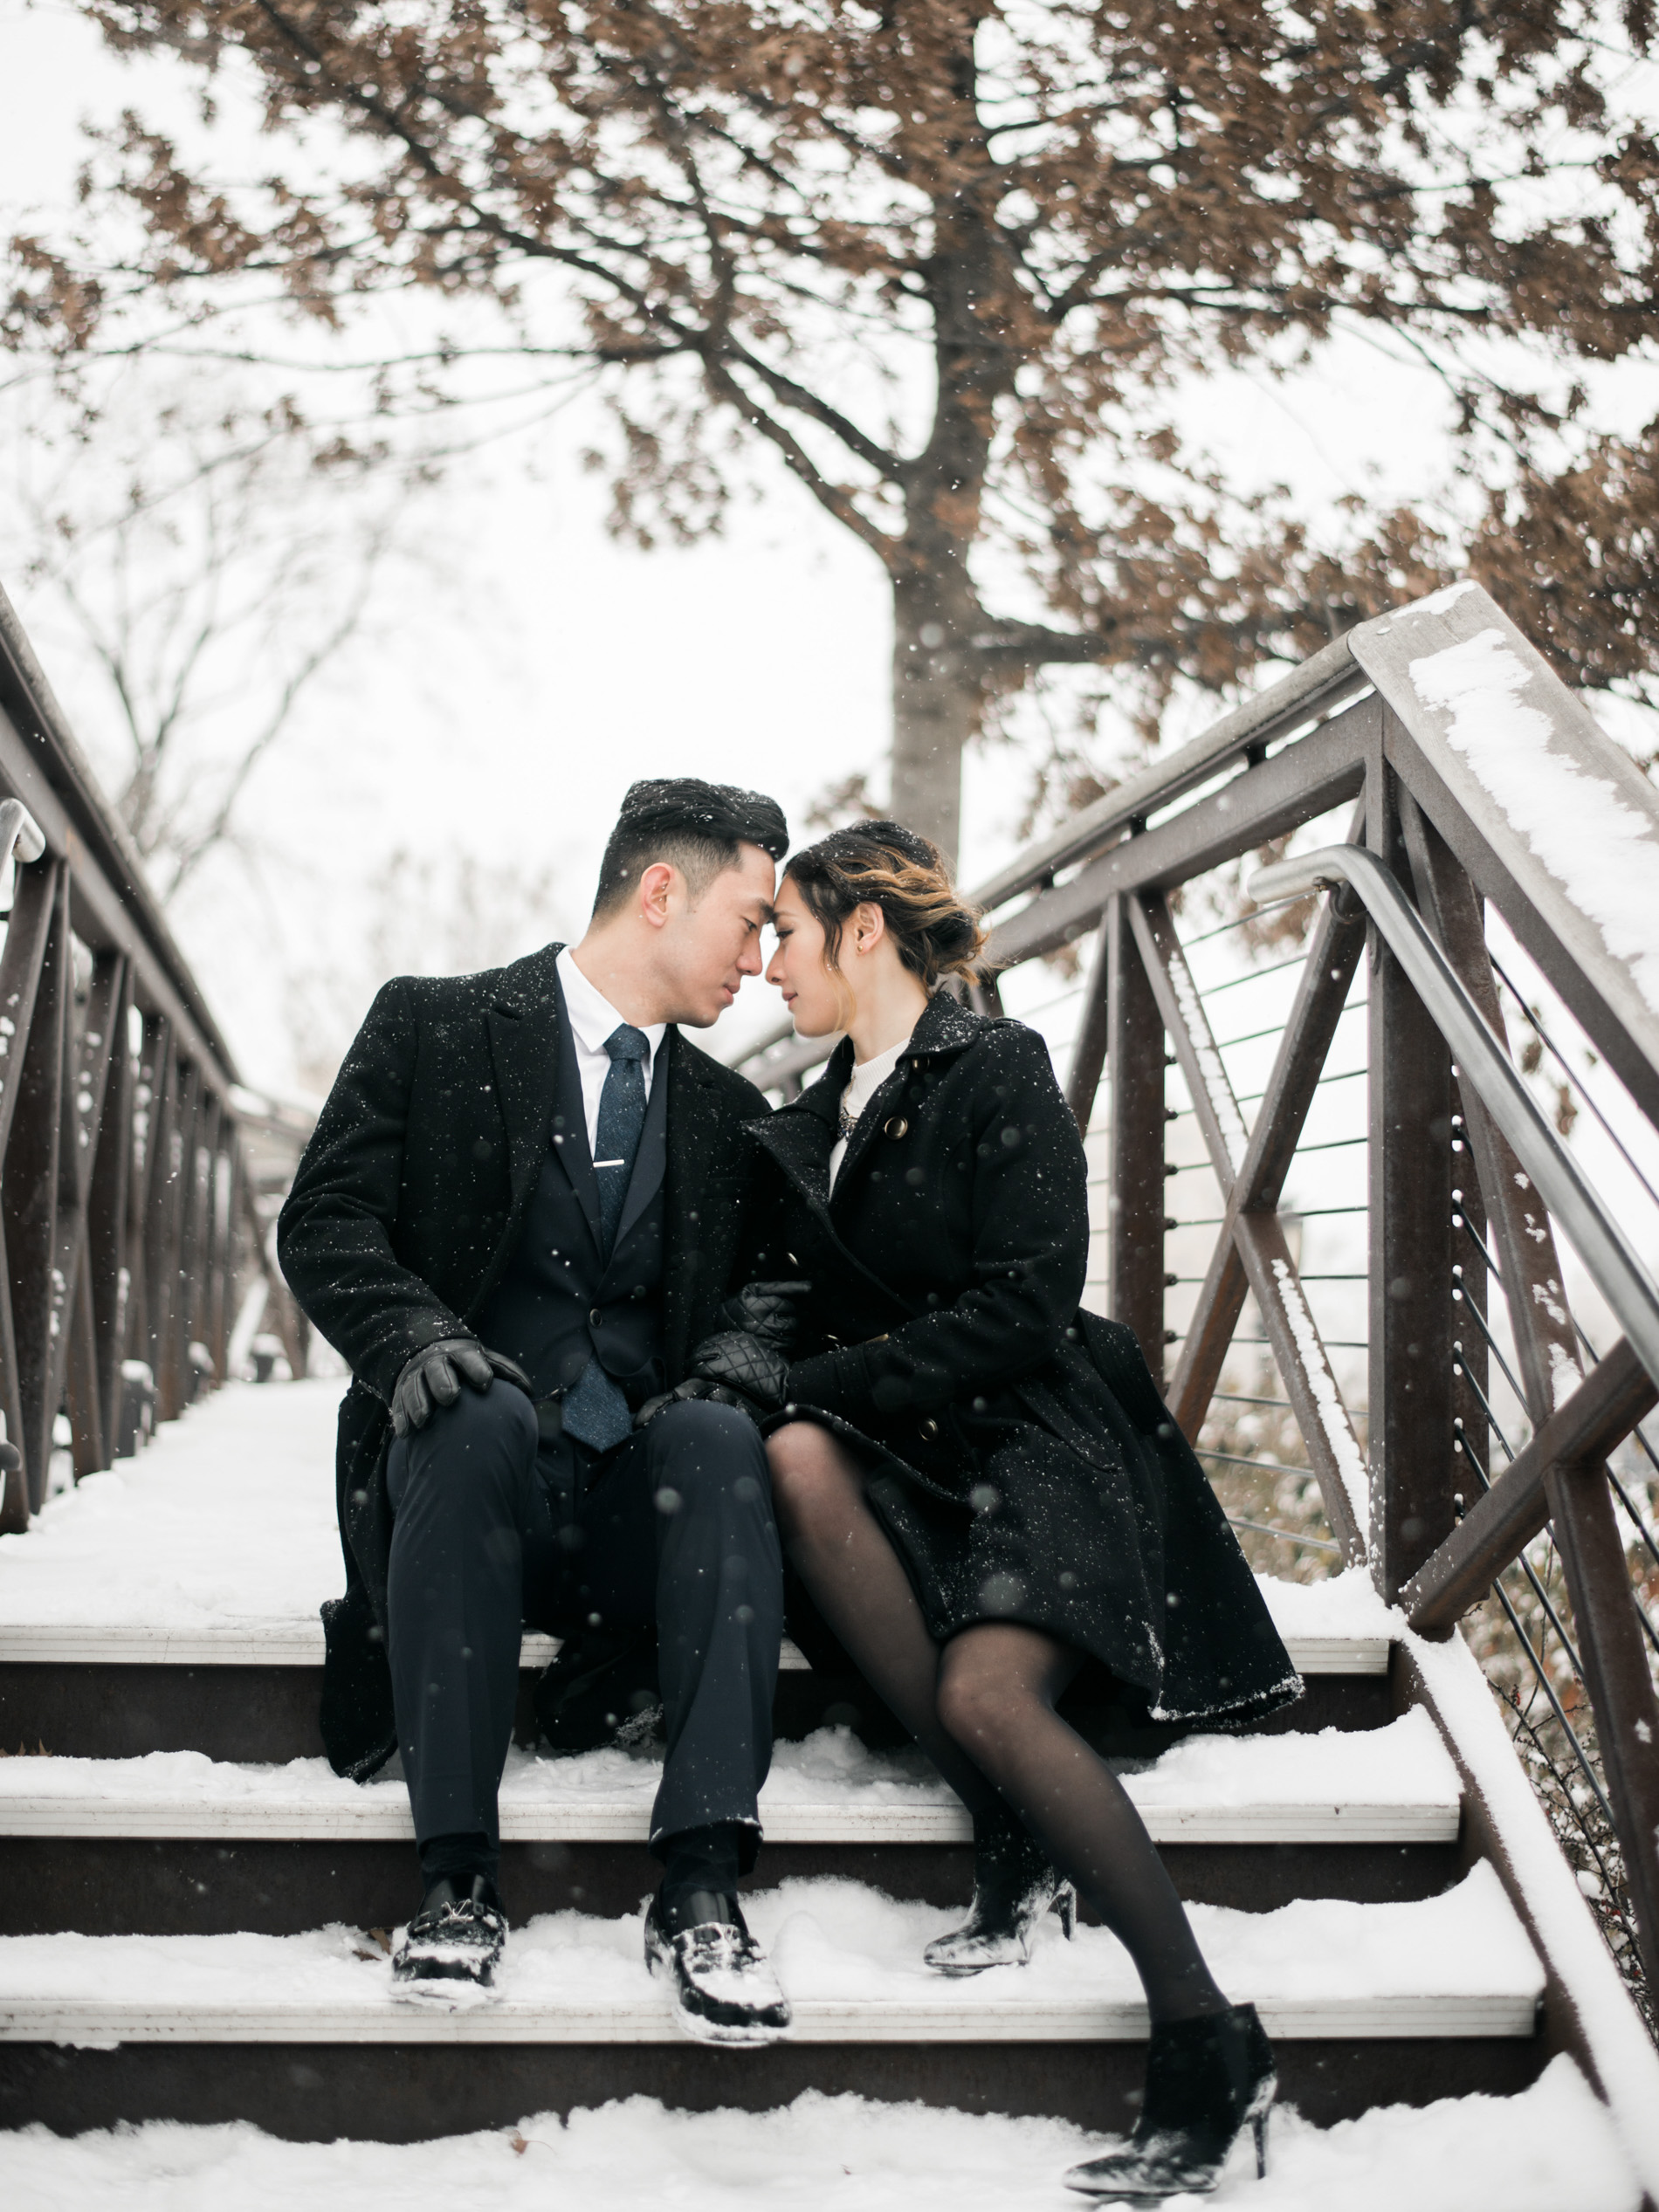 philadelphia engagement, philadelphia wedding photographer, destination wedding photographer, snowy winter engagement, museum of art engagement, philadelphia fine art wedding photographer